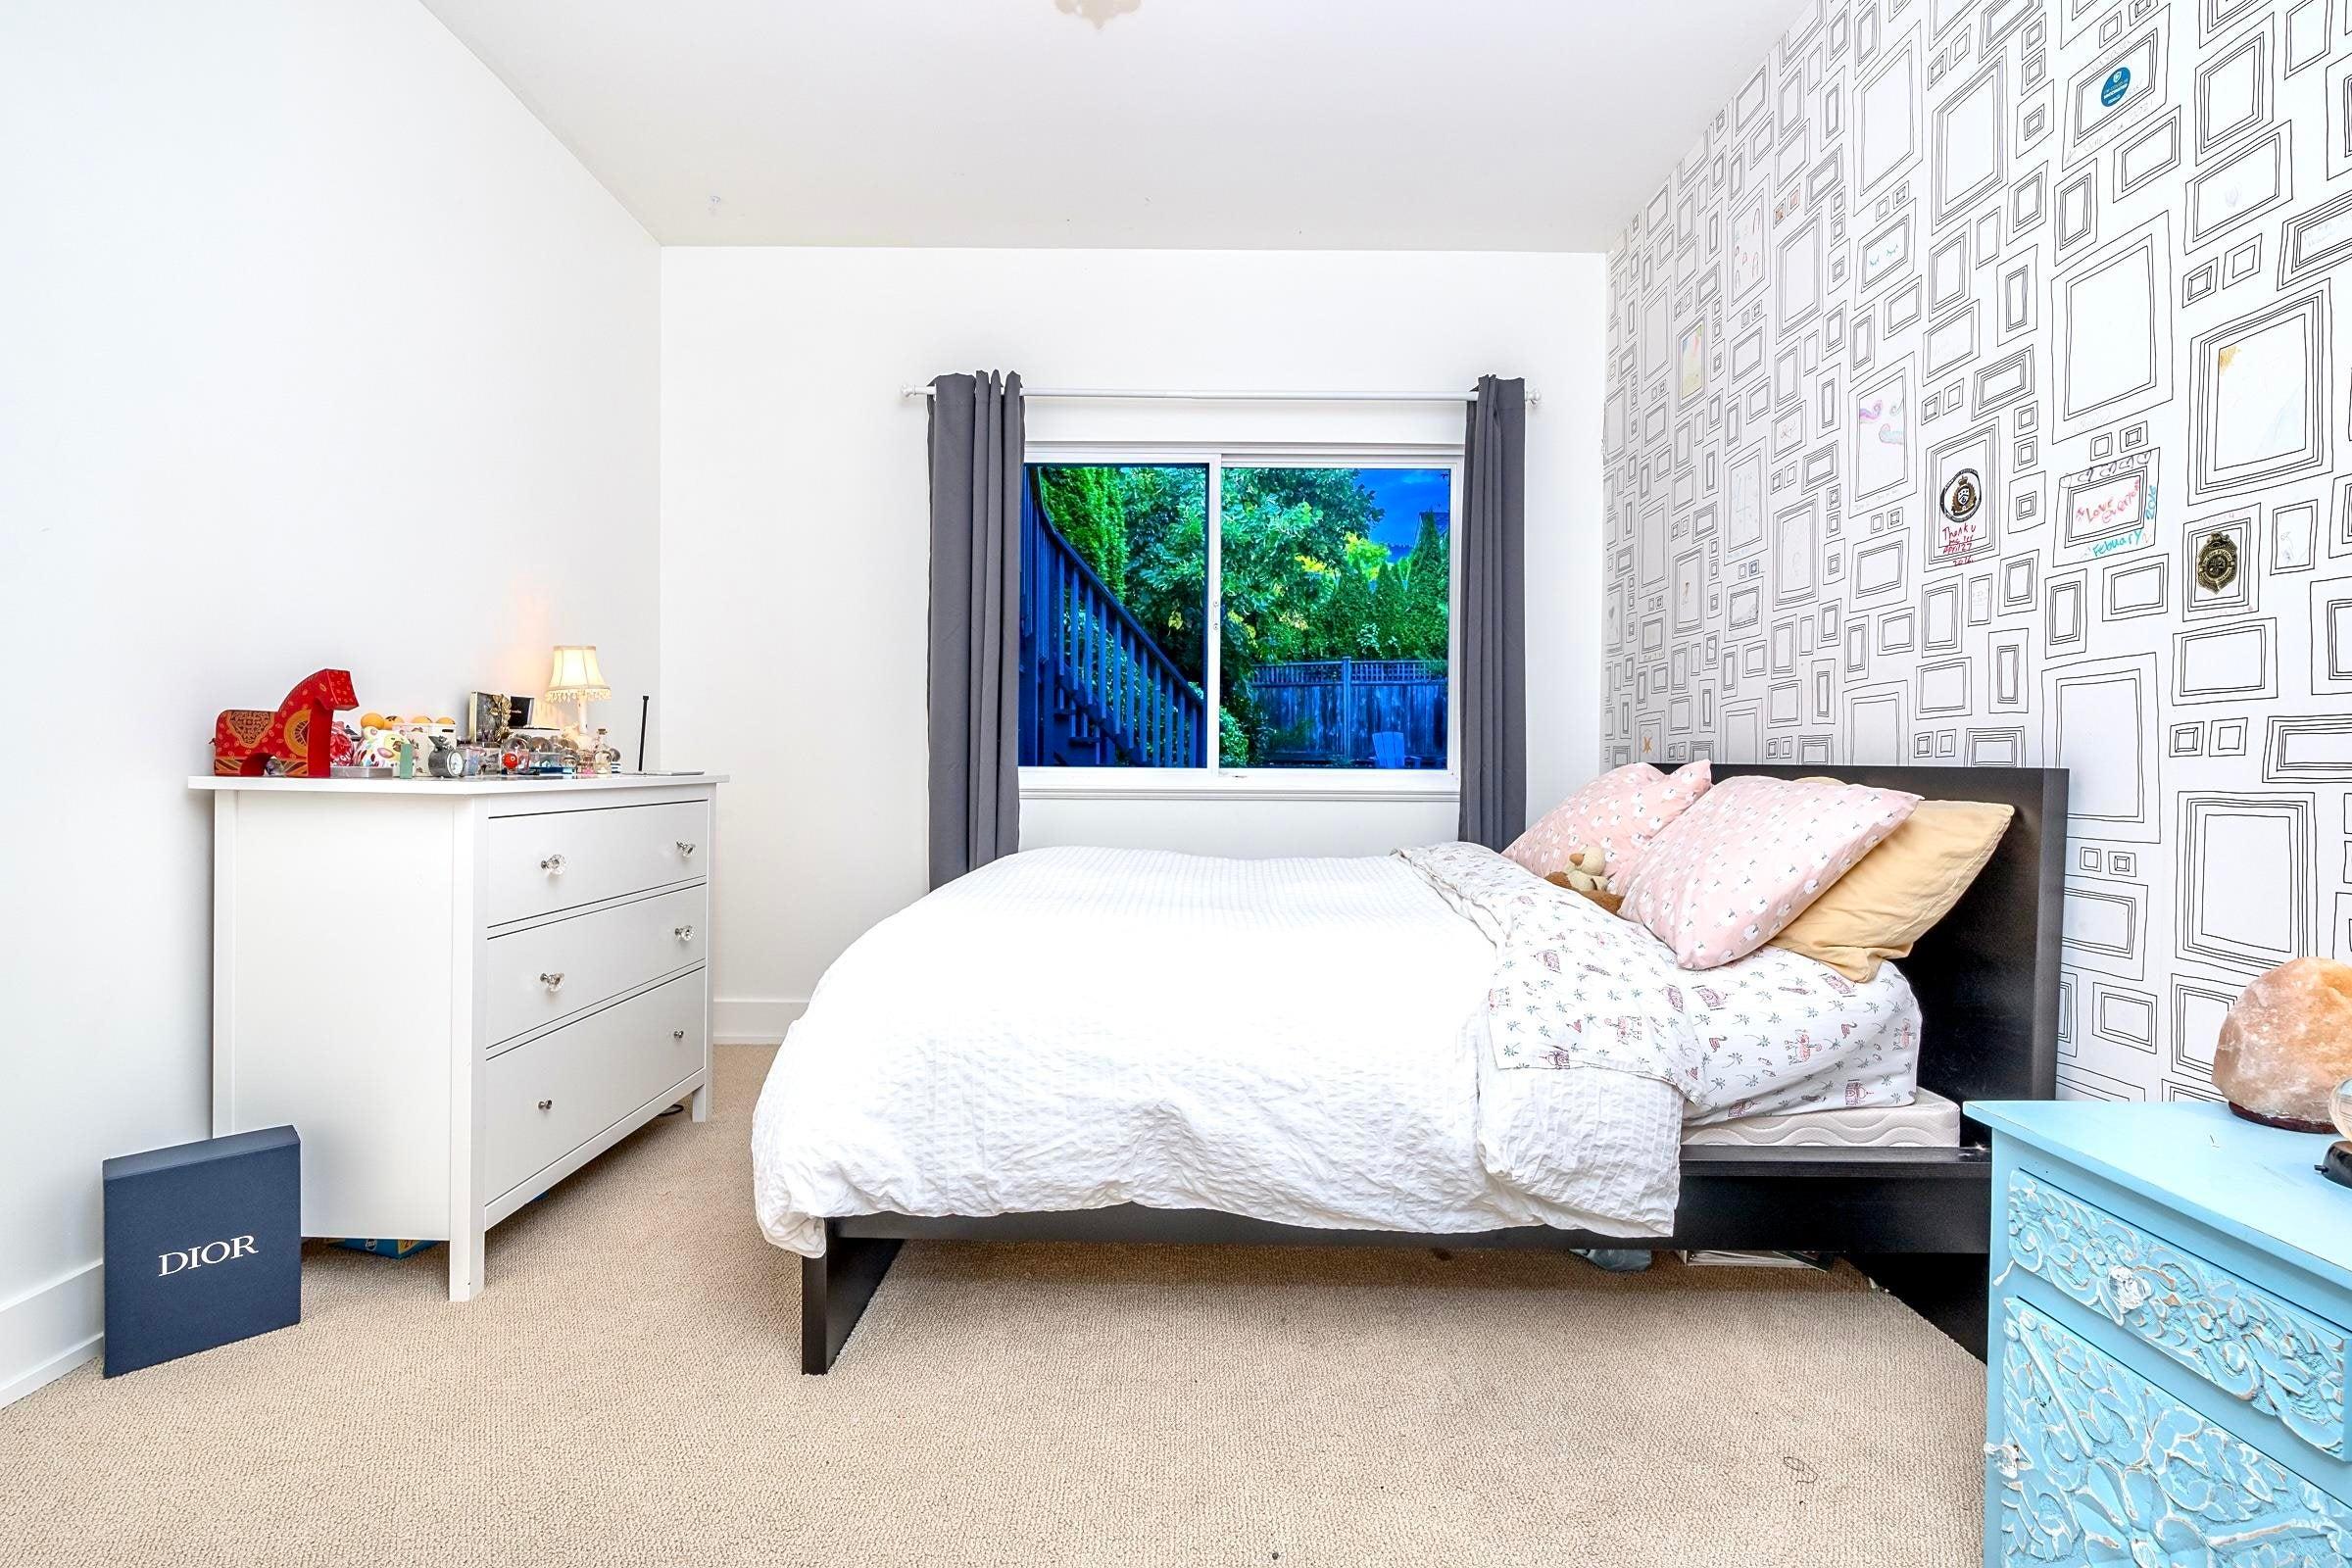 2321 MARINE DRIVE - Dundarave 1/2 Duplex for sale, 3 Bedrooms (R2617952) - #26